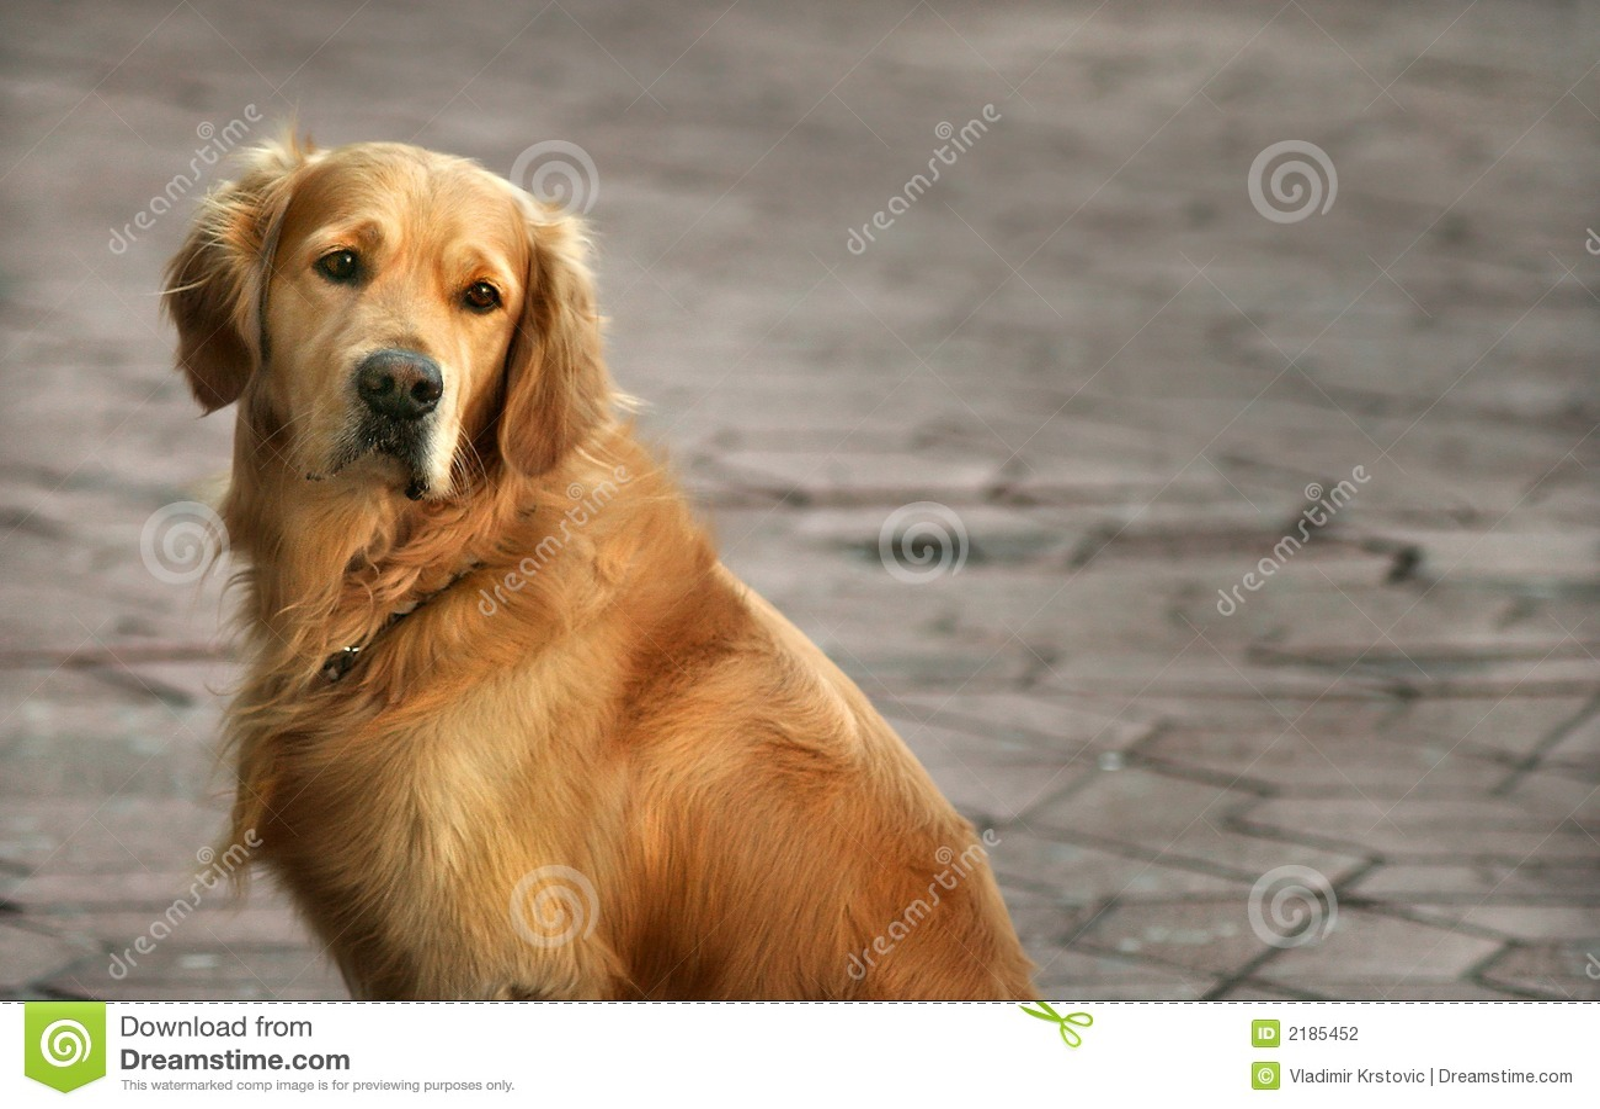 Goldenes Apportierhund-entferntes Anstarren